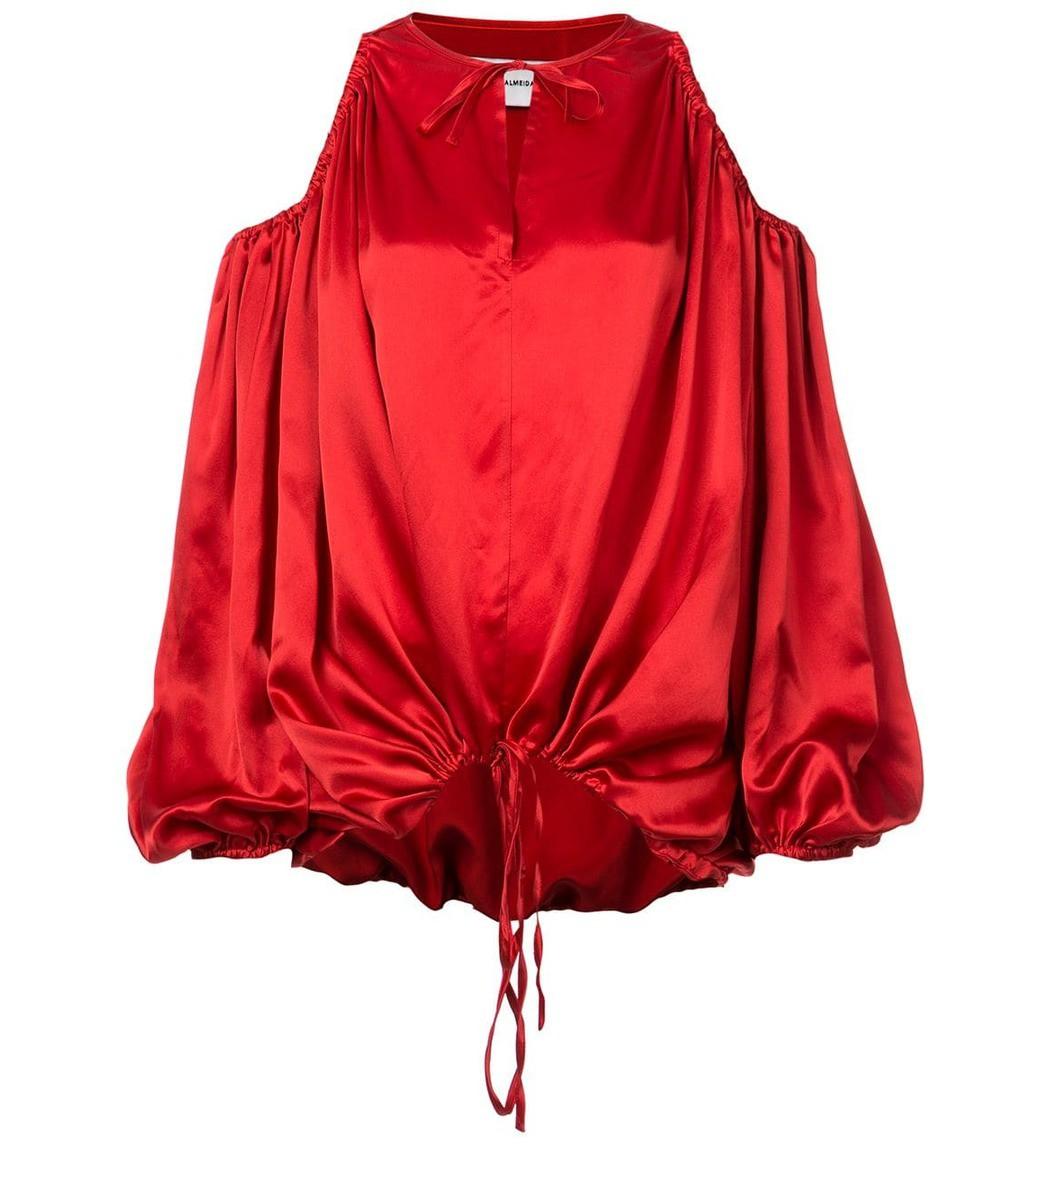 Marques' Almeida cut-out shoulder blouse